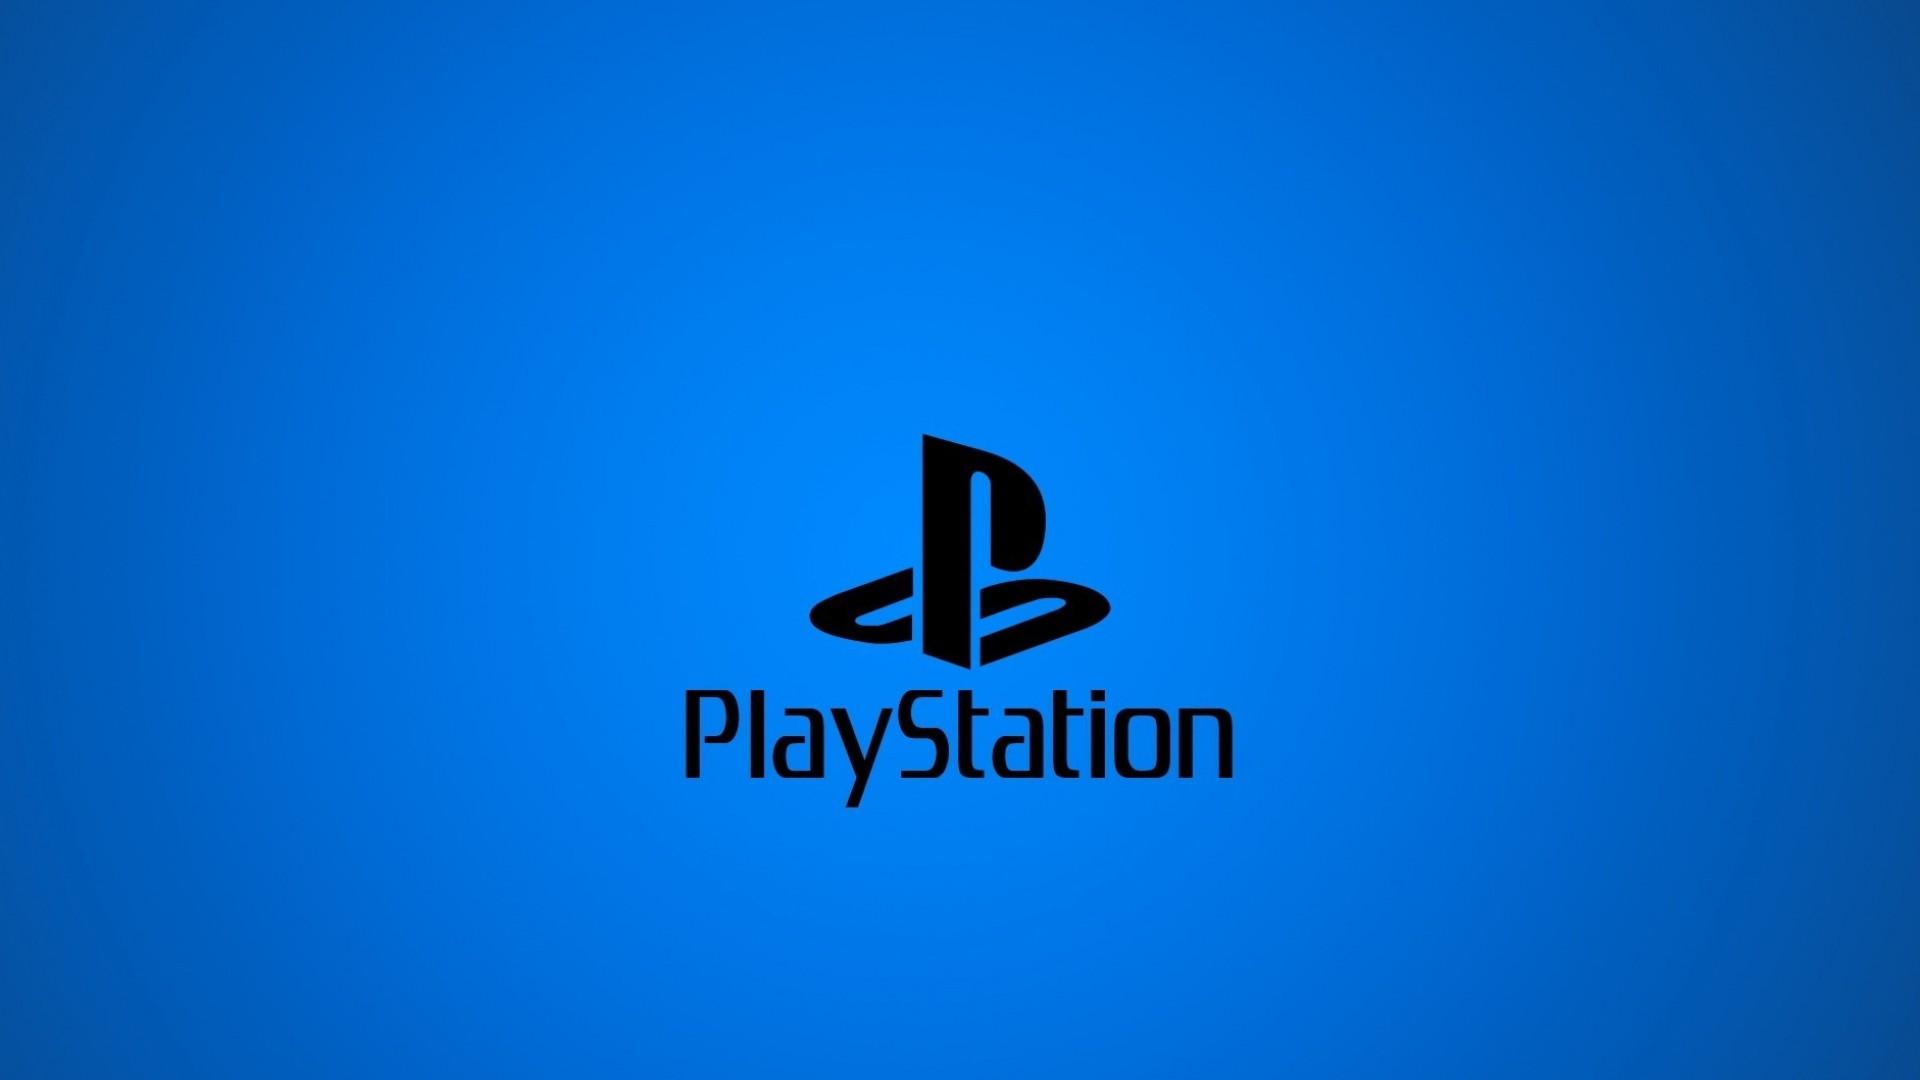 ... sony-playstation-hd-wallpaper ...